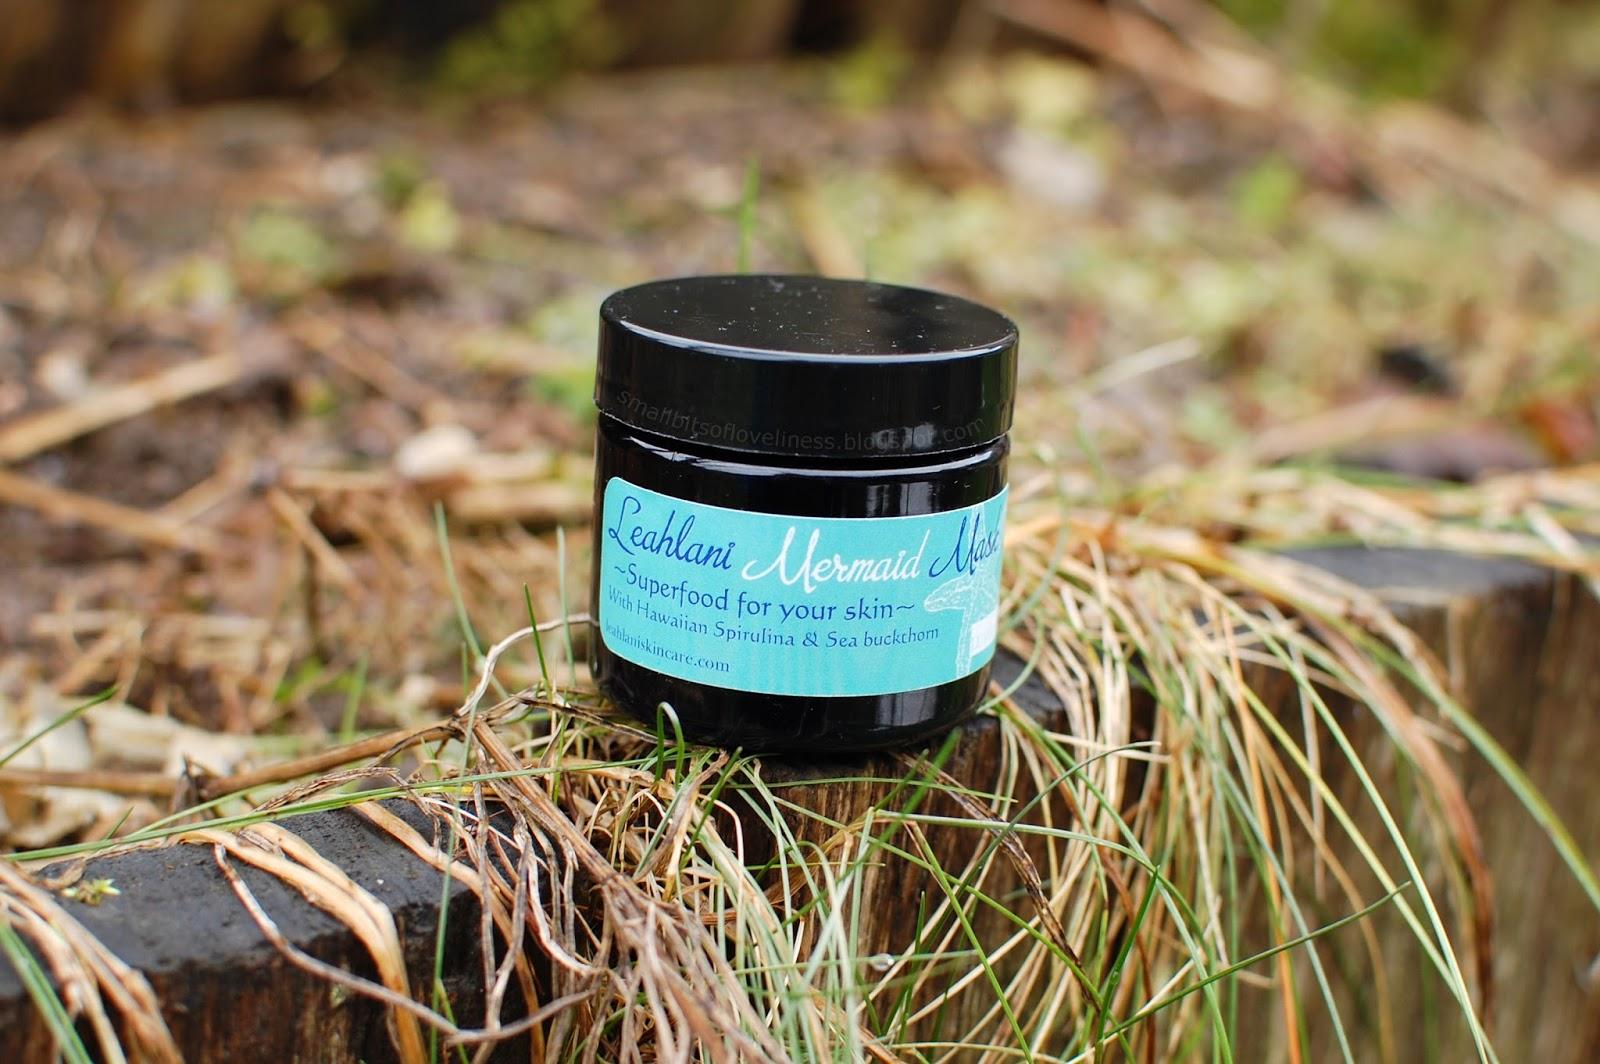 Leahlani Skincare Mermaid Mask Superfood for your skin